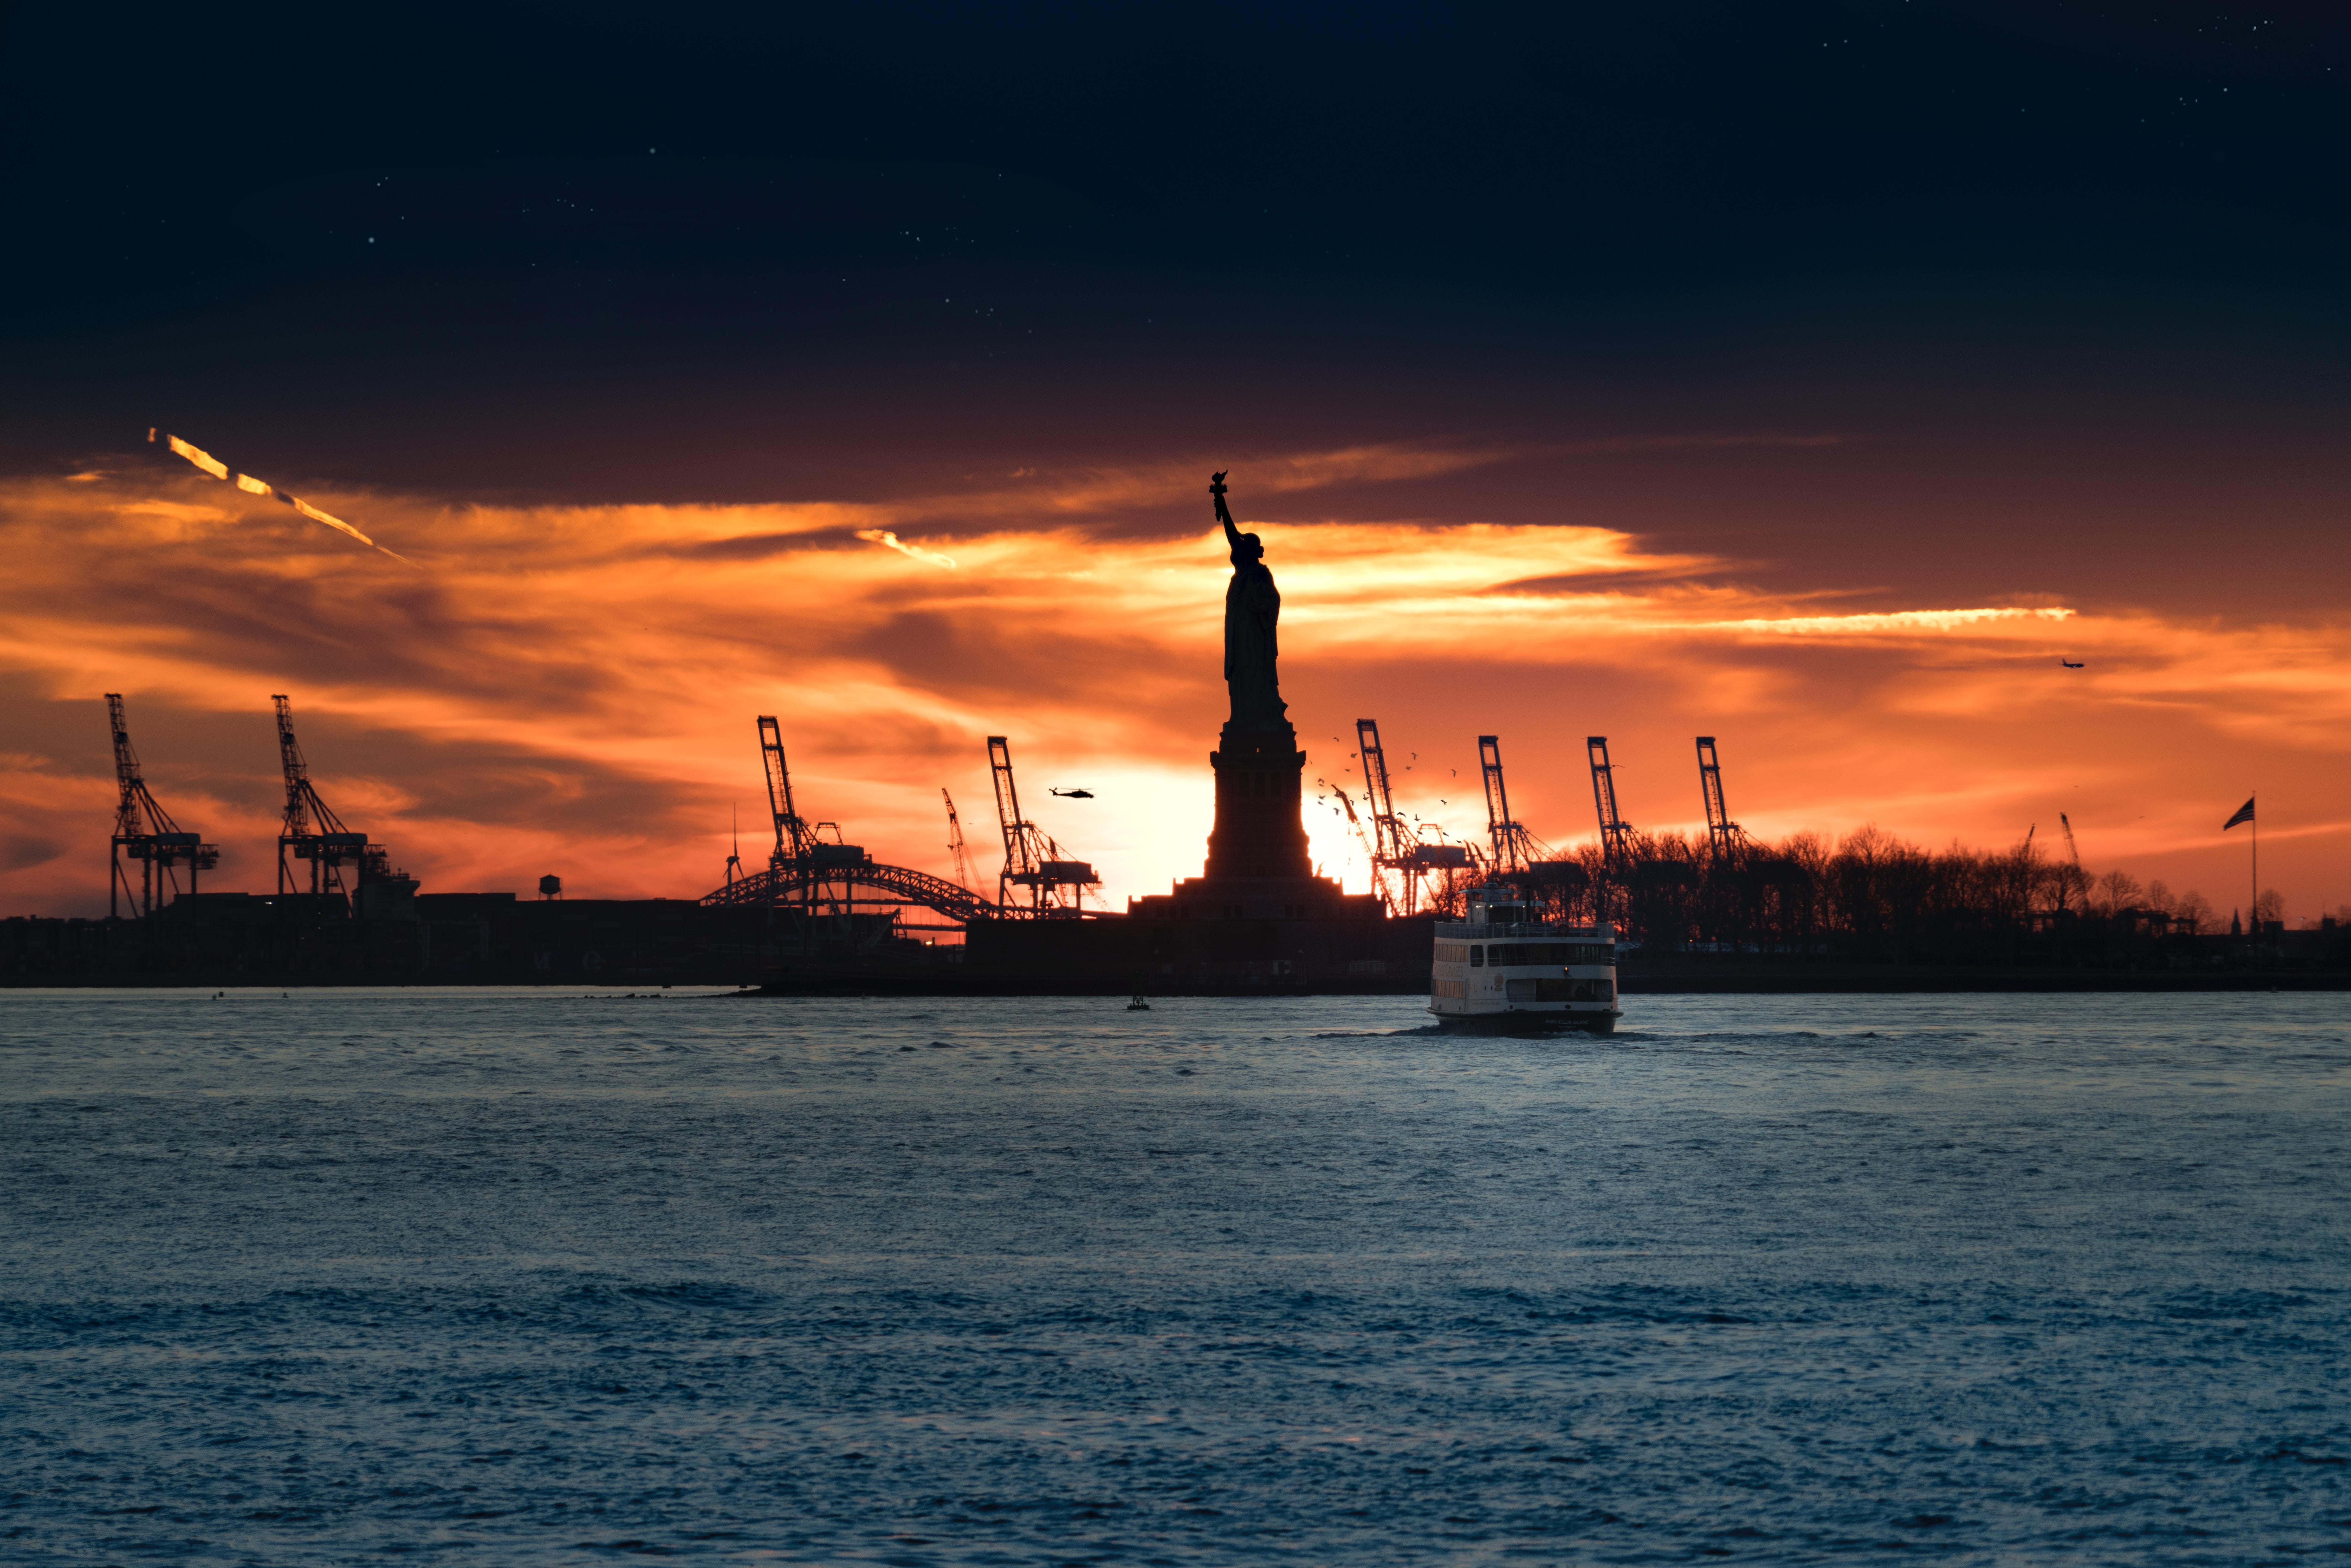 Segelschiffe auf dem meer sonnenuntergang  Kostenlose foto : Meer, Küste, Ozean, Horizont, Sonnenaufgang ...